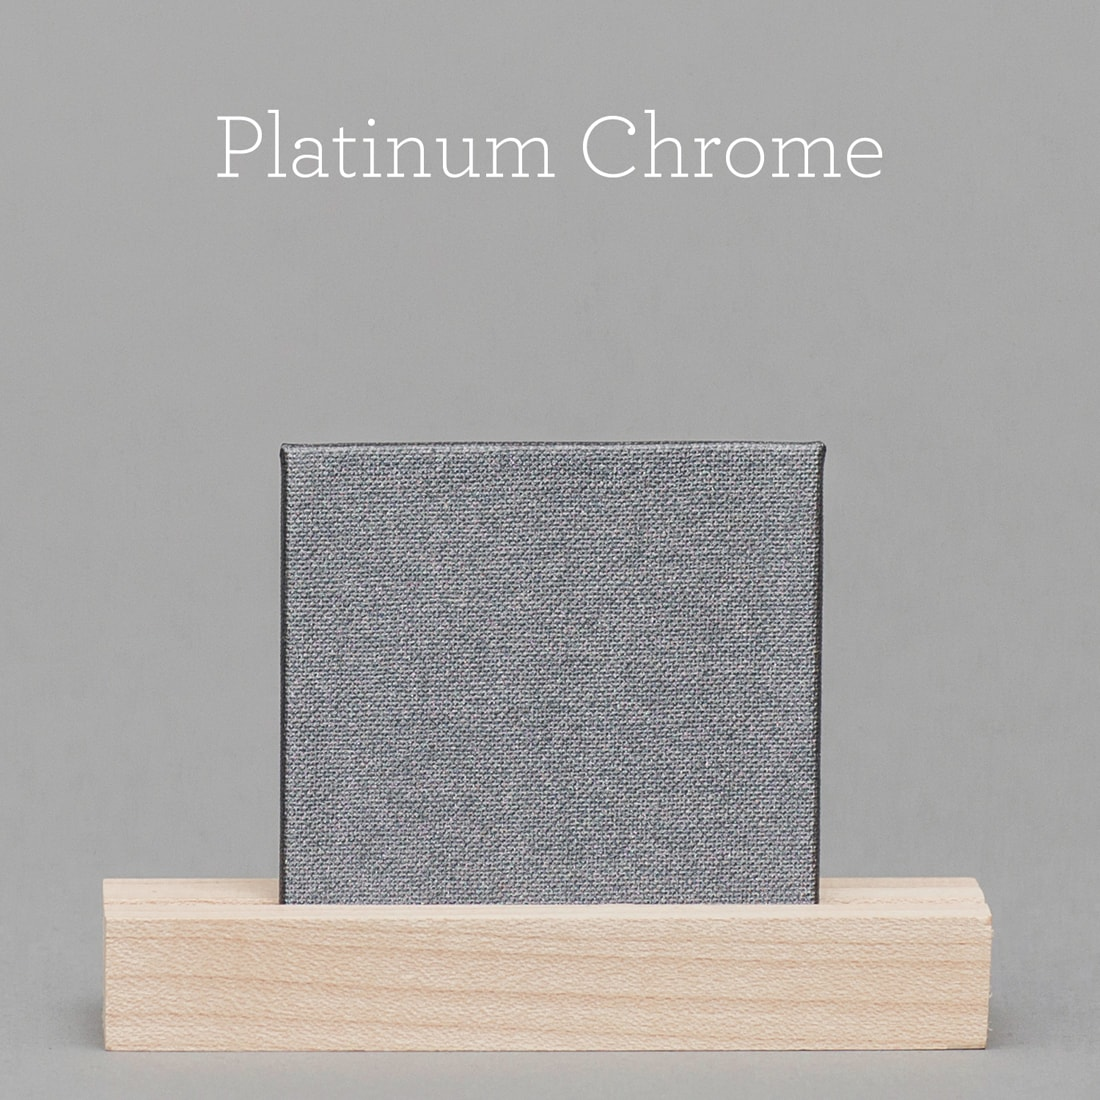 PlatinumChrome.jpg